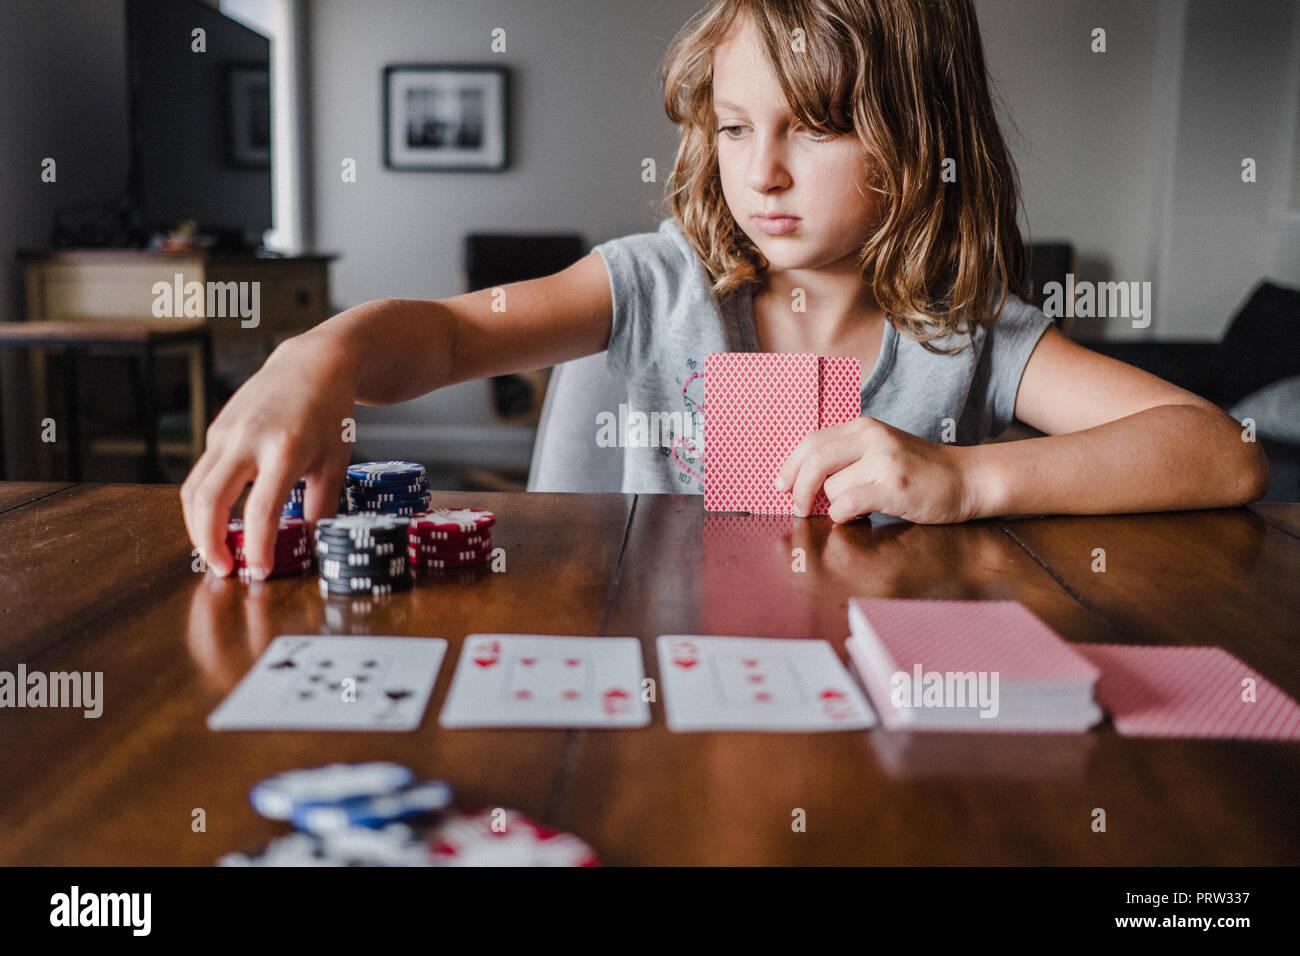 Girl playing cards at table, stacking gambling chips - Stock Image